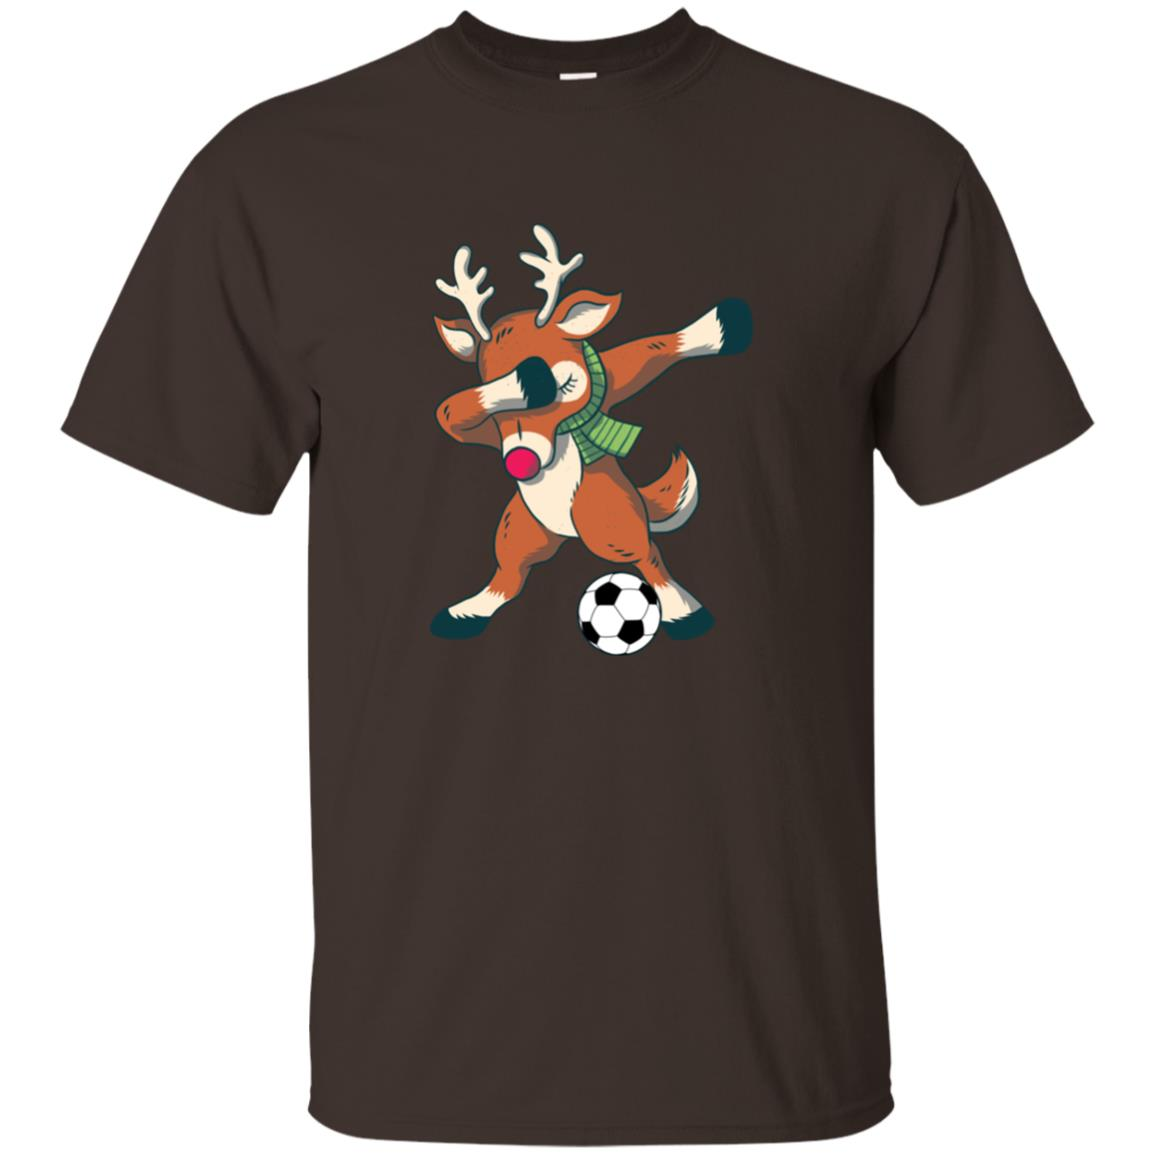 Dabbing Reindeer Soccer – Funny Christmas Dab Unisex Short Sleeve